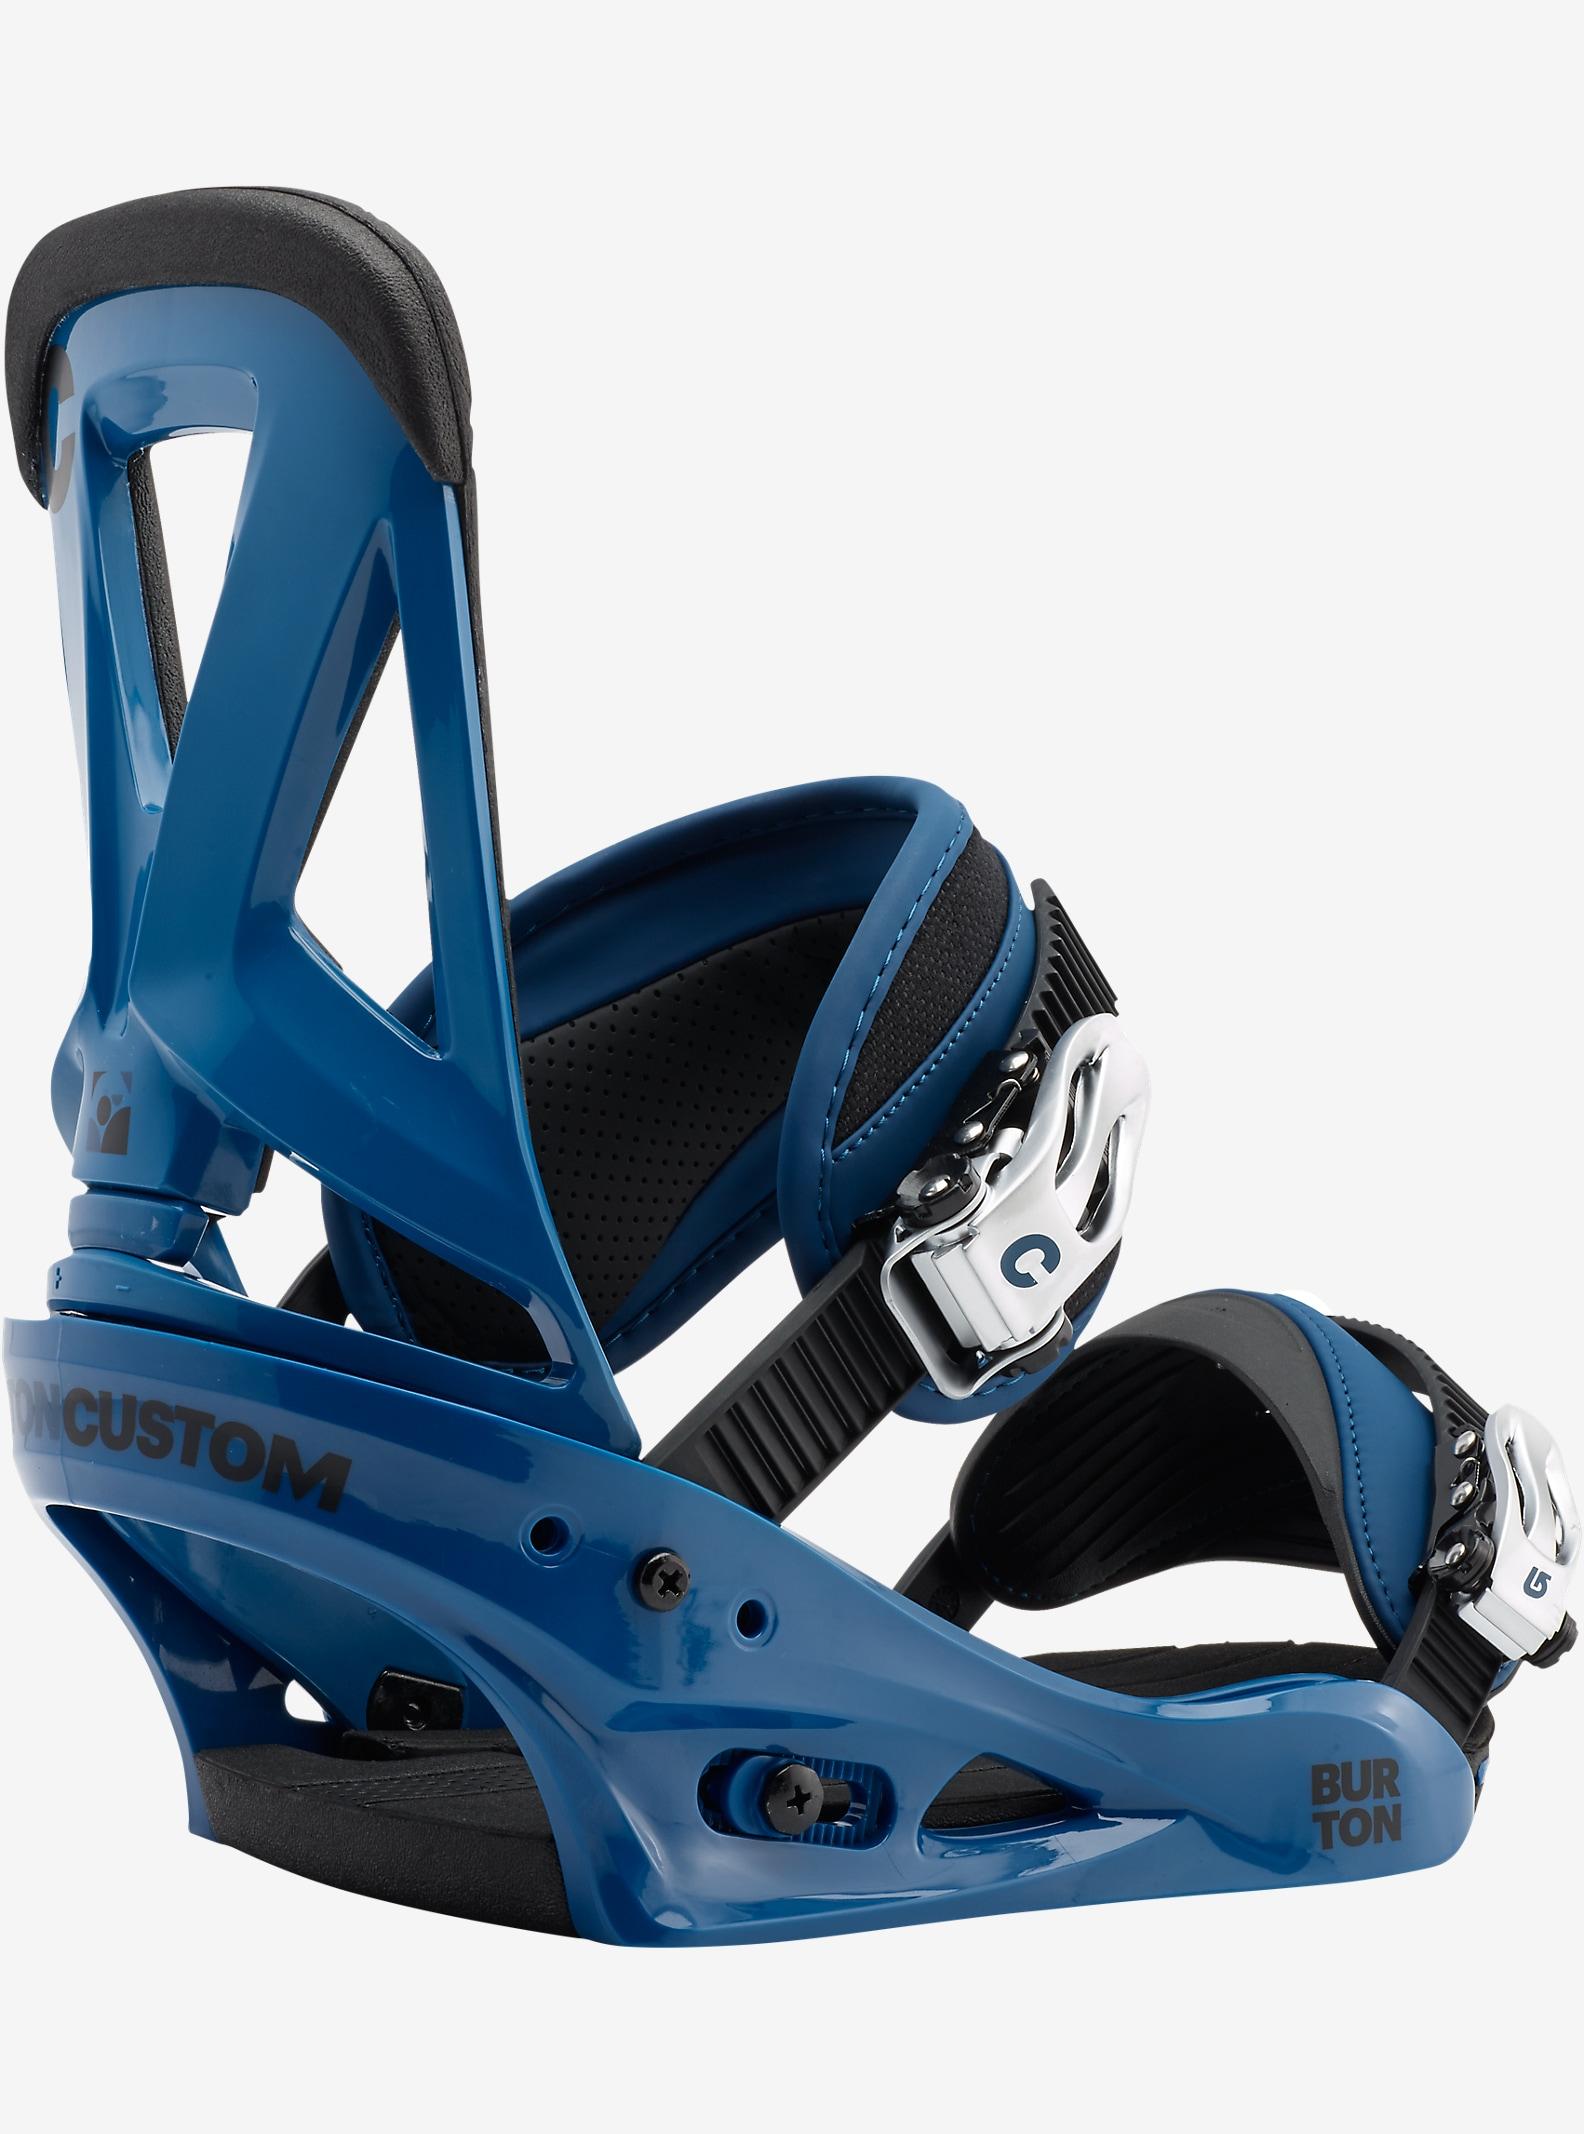 Burton Custom Snowboardbindung angezeigt in Blue